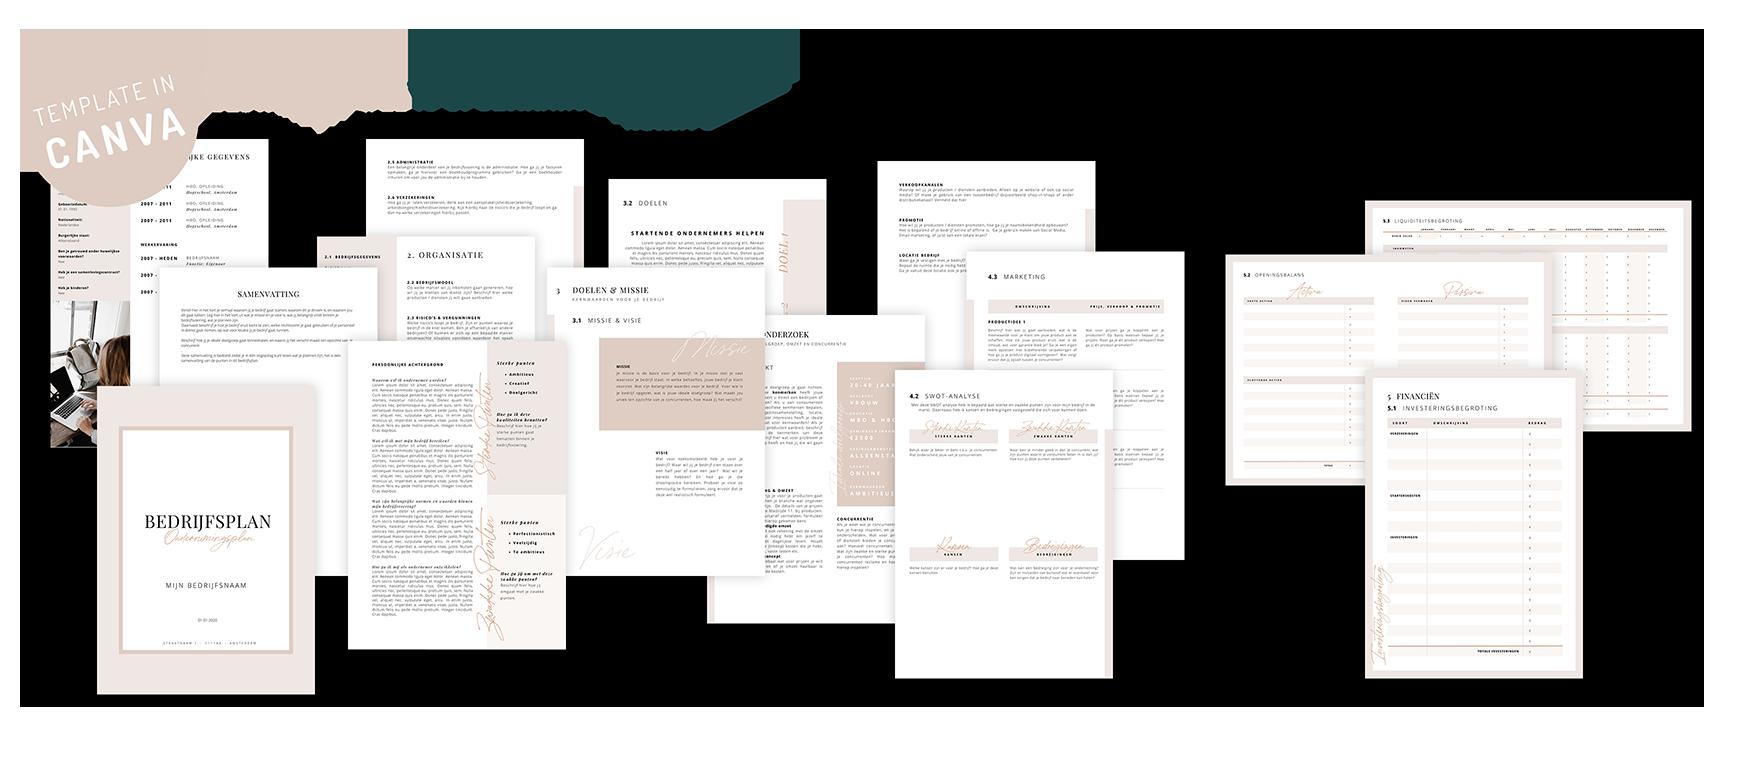 ondernemingsplan template bedrijfsplan template in canva startende ondernemer